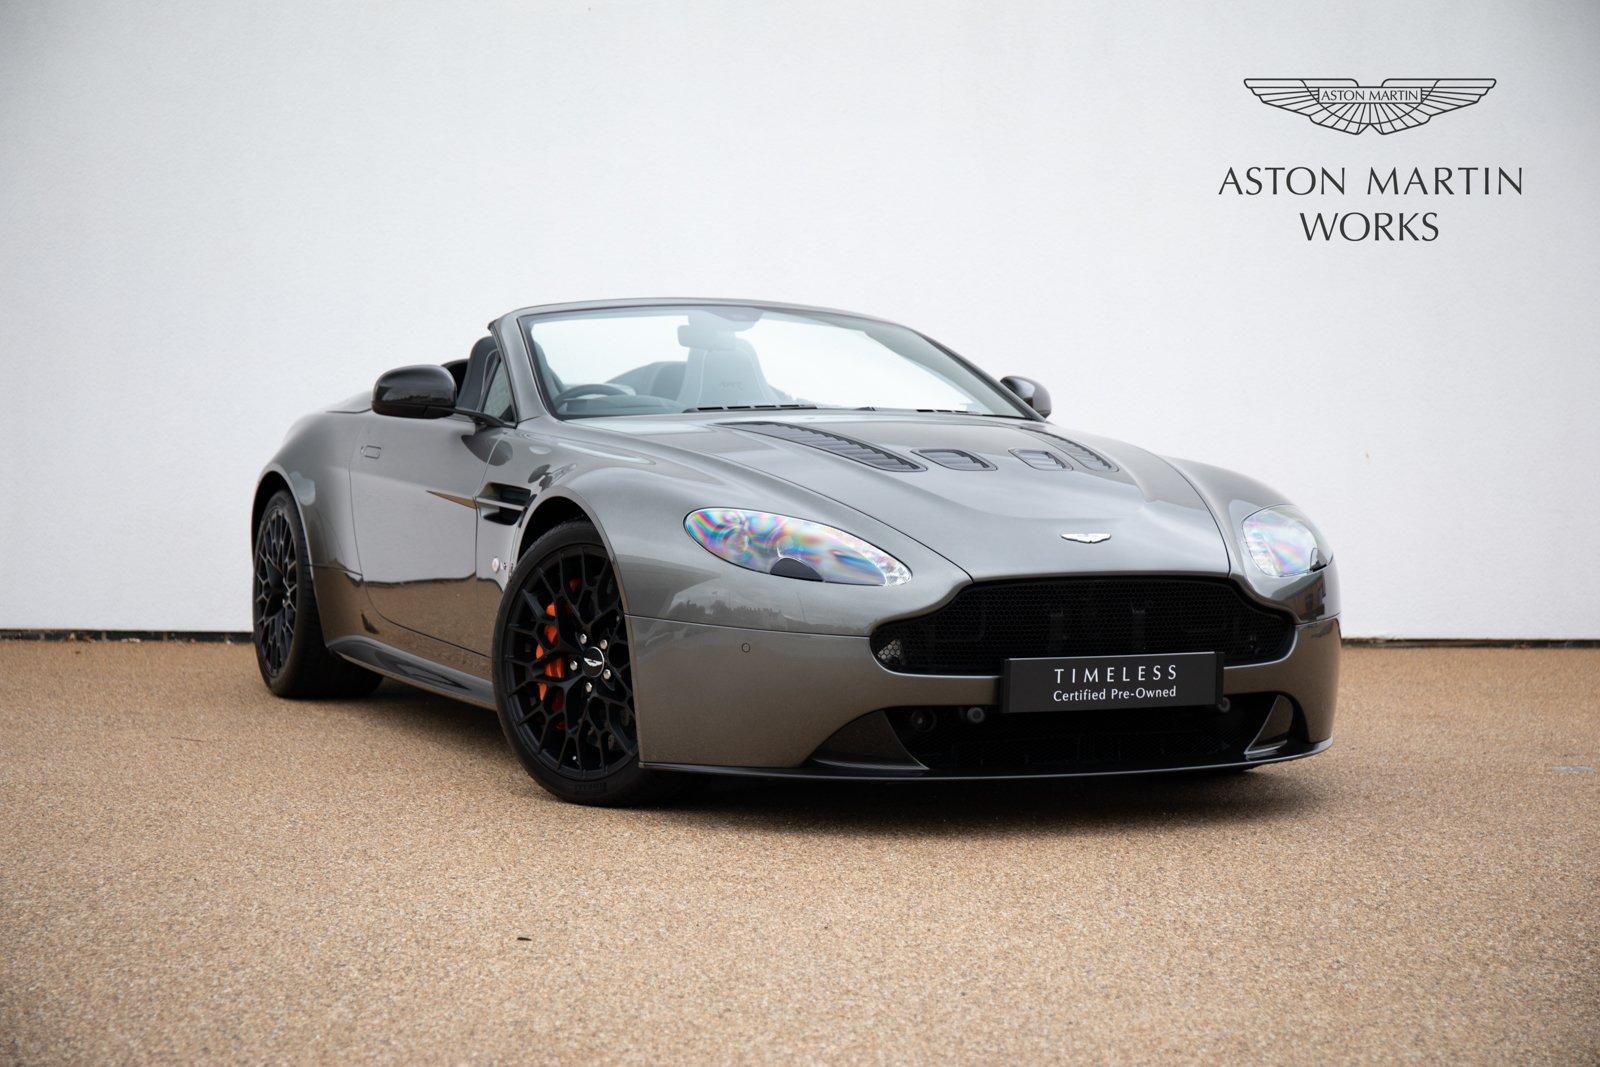 2017 Aston Martin V12 Vantage Amr Manual Transmission Classic Driver Market